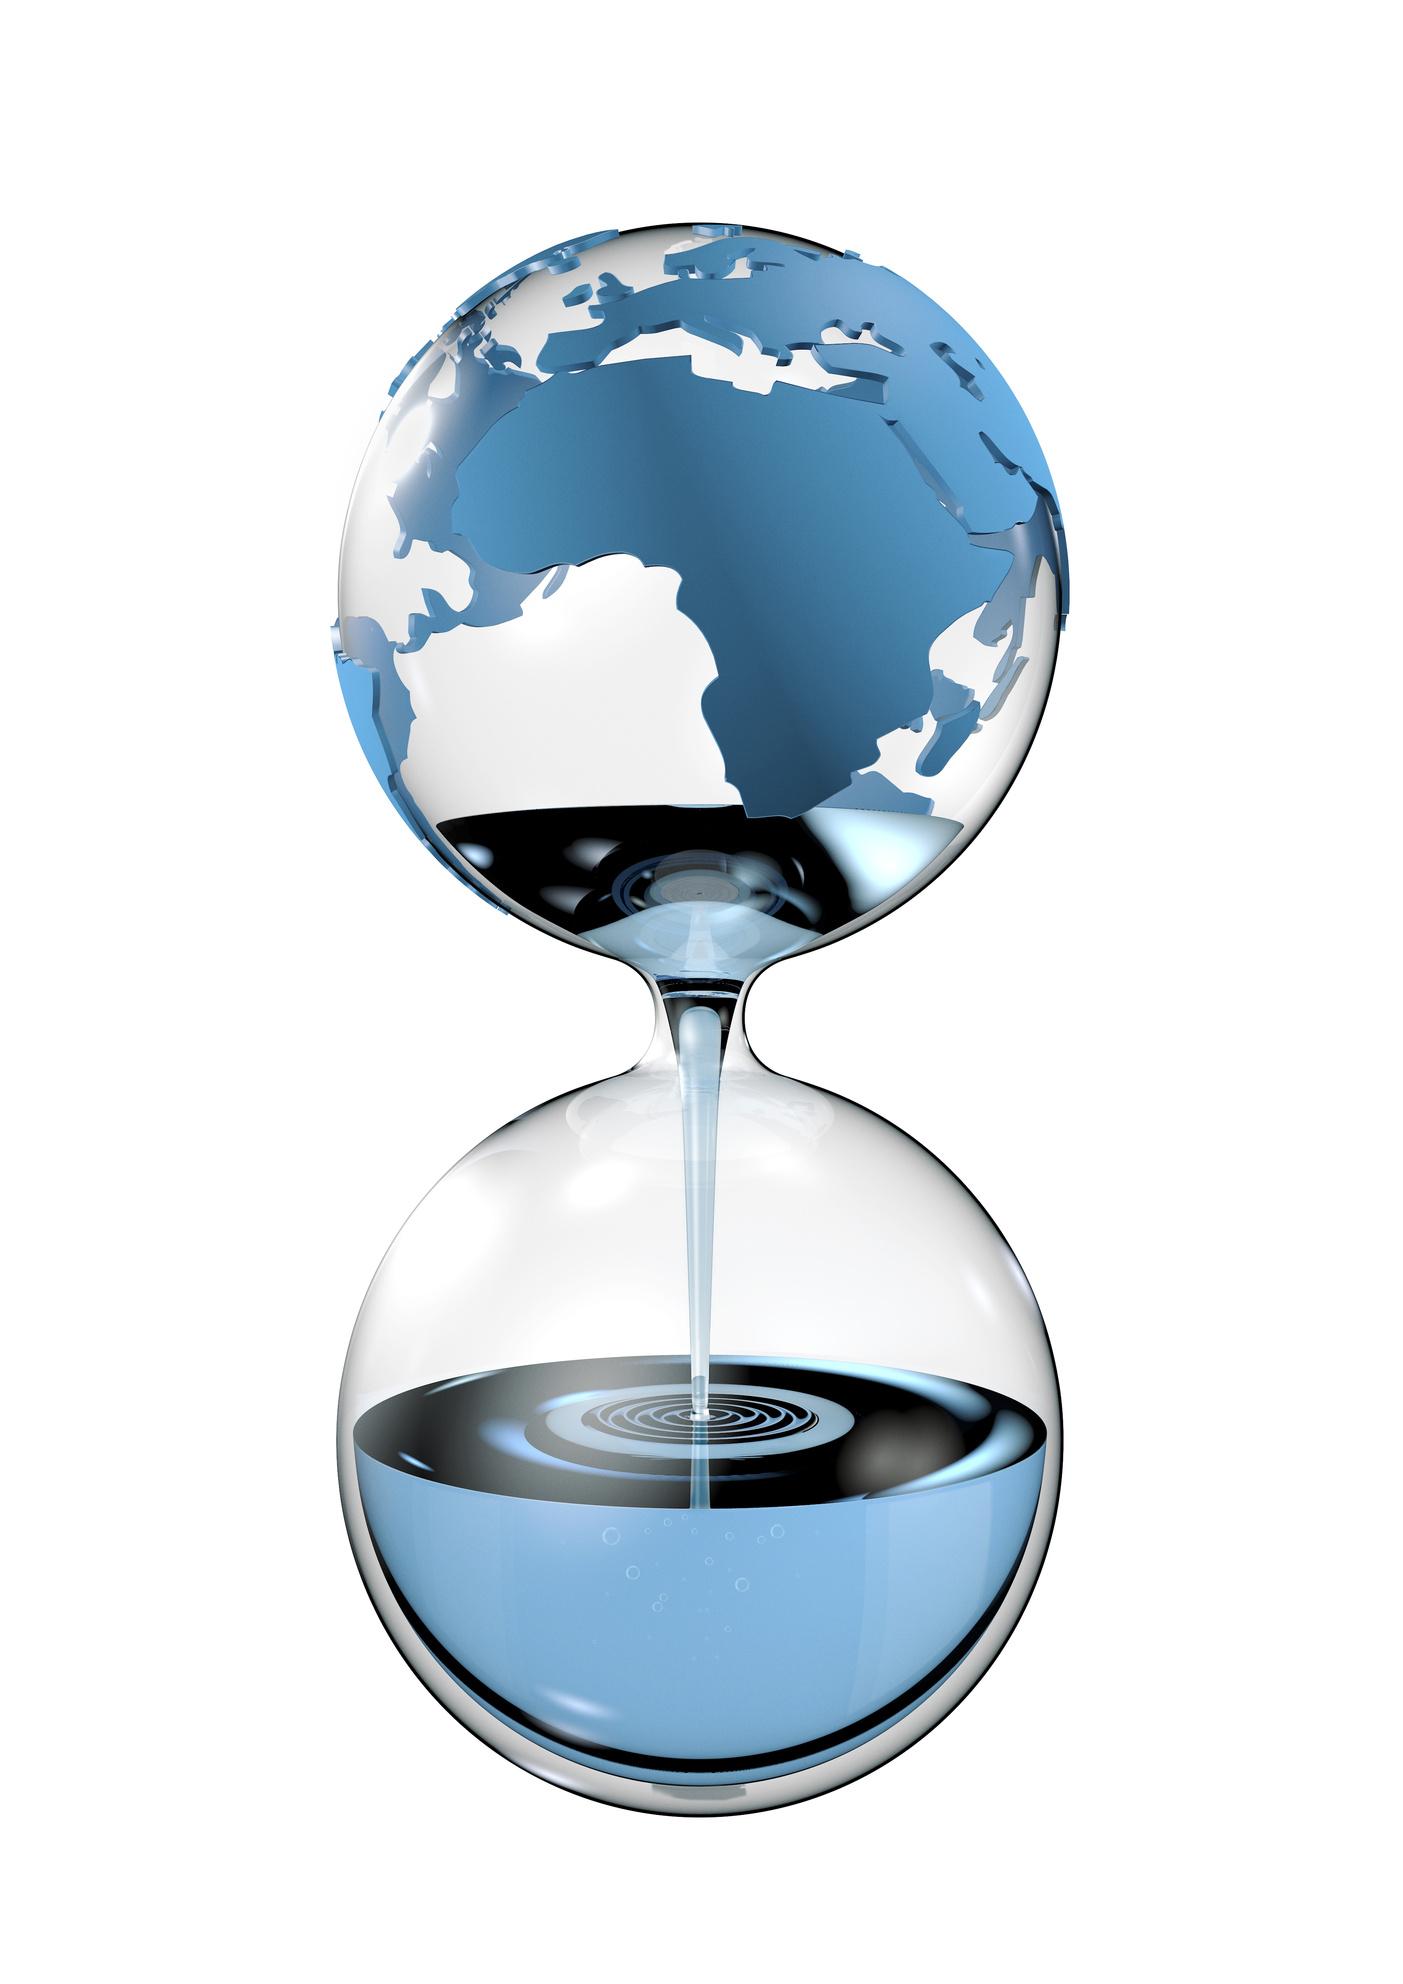 021438136_Water hourglass.jpeg